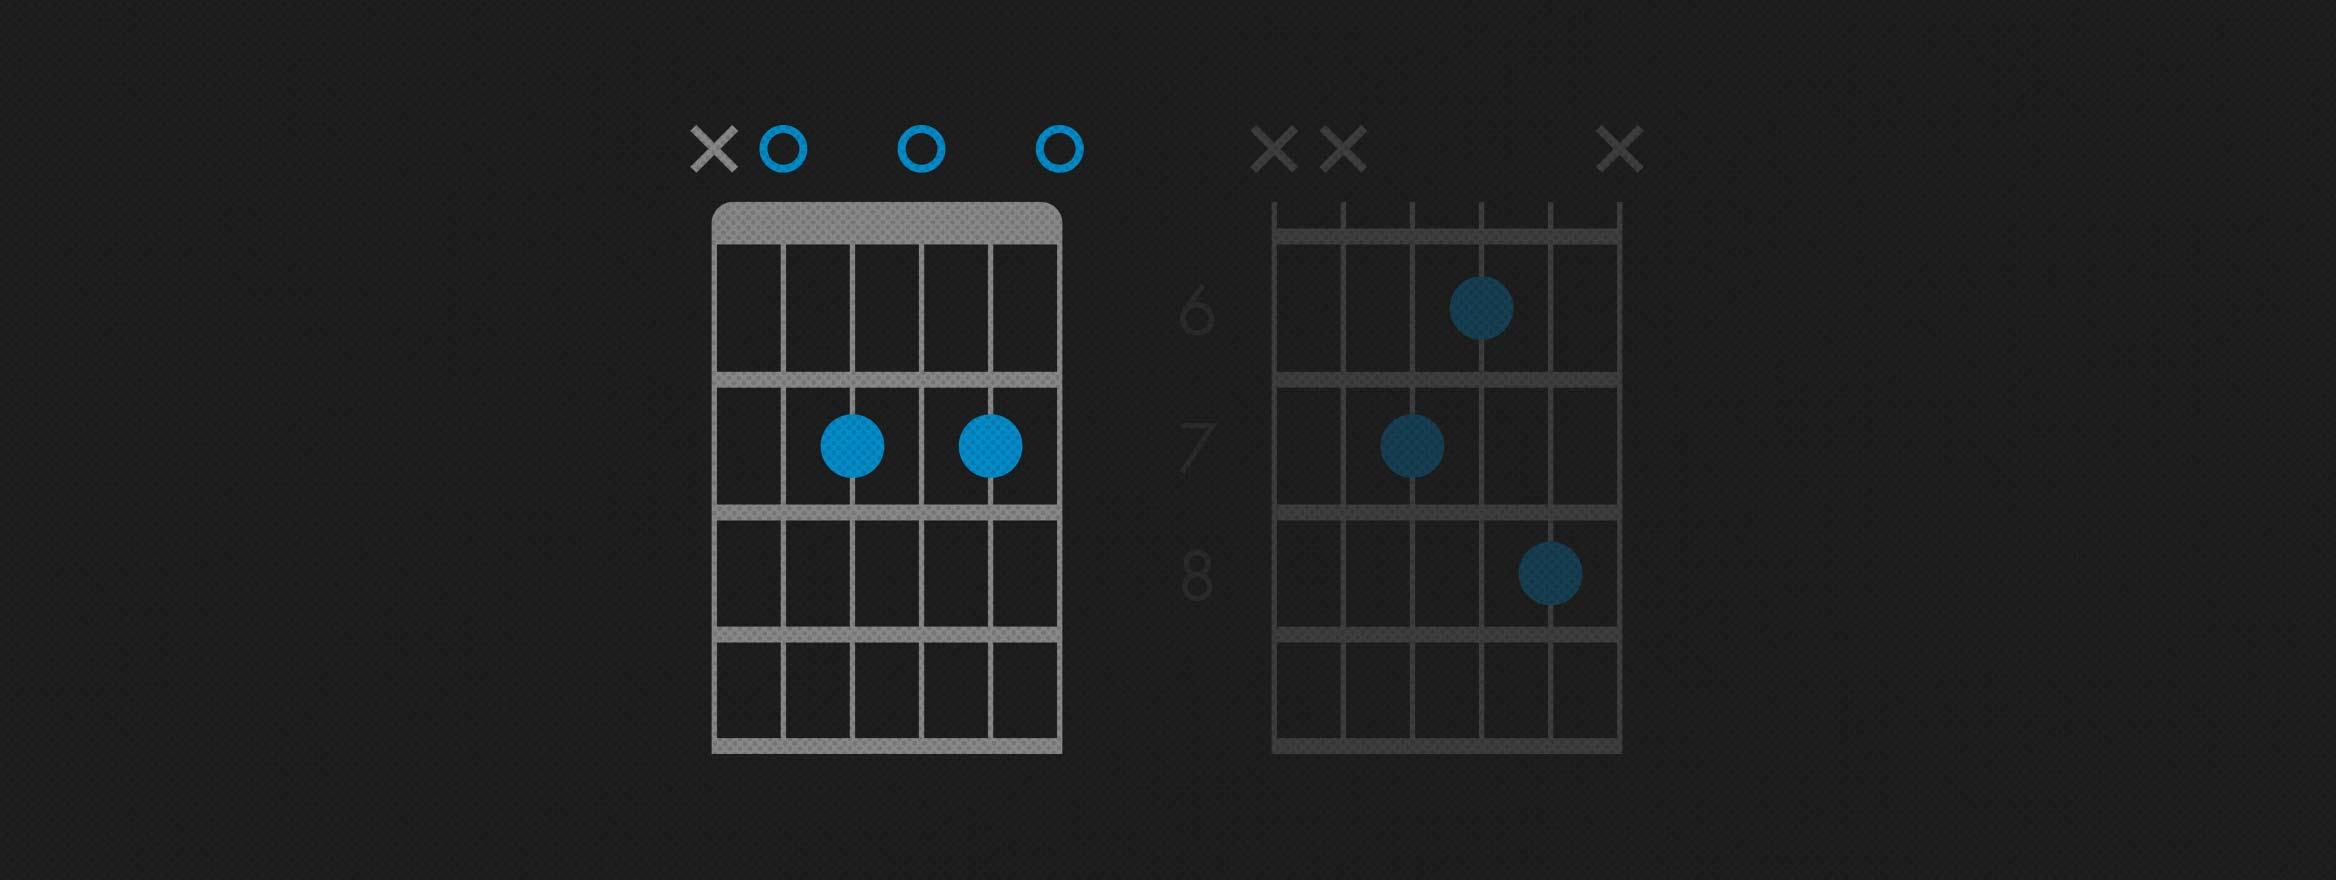 How to Play an A15 Guitar Chord   A dominant 15th Chord   Fender Play